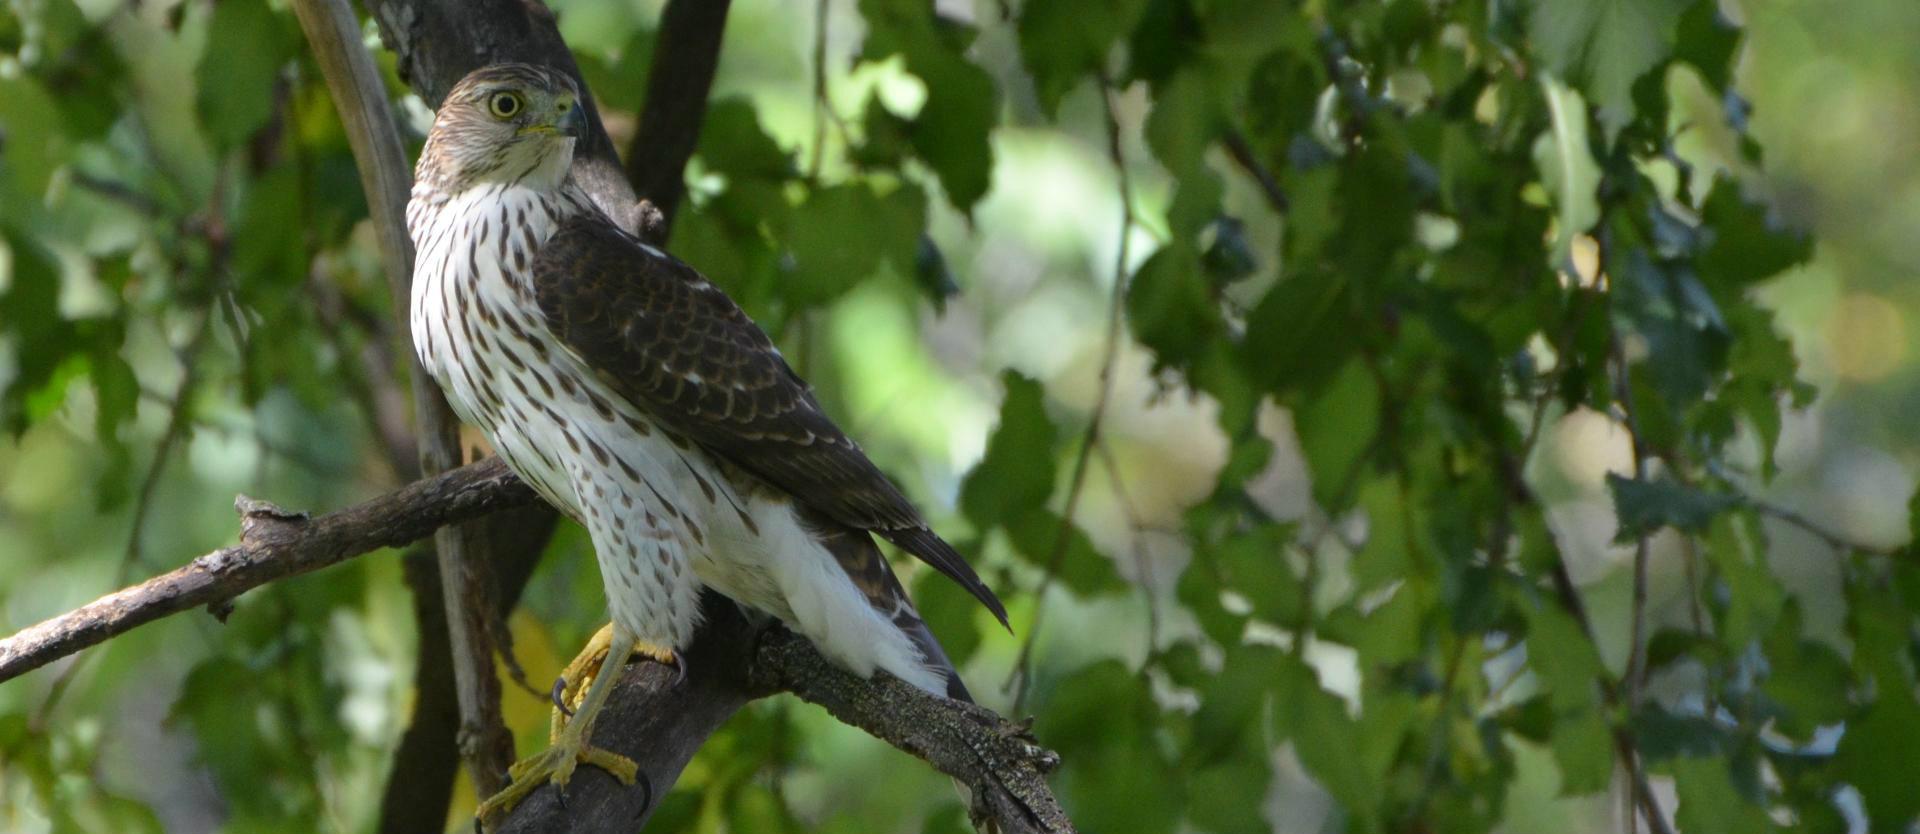 North Carolina Mountain Birds: Cooper's Hawk